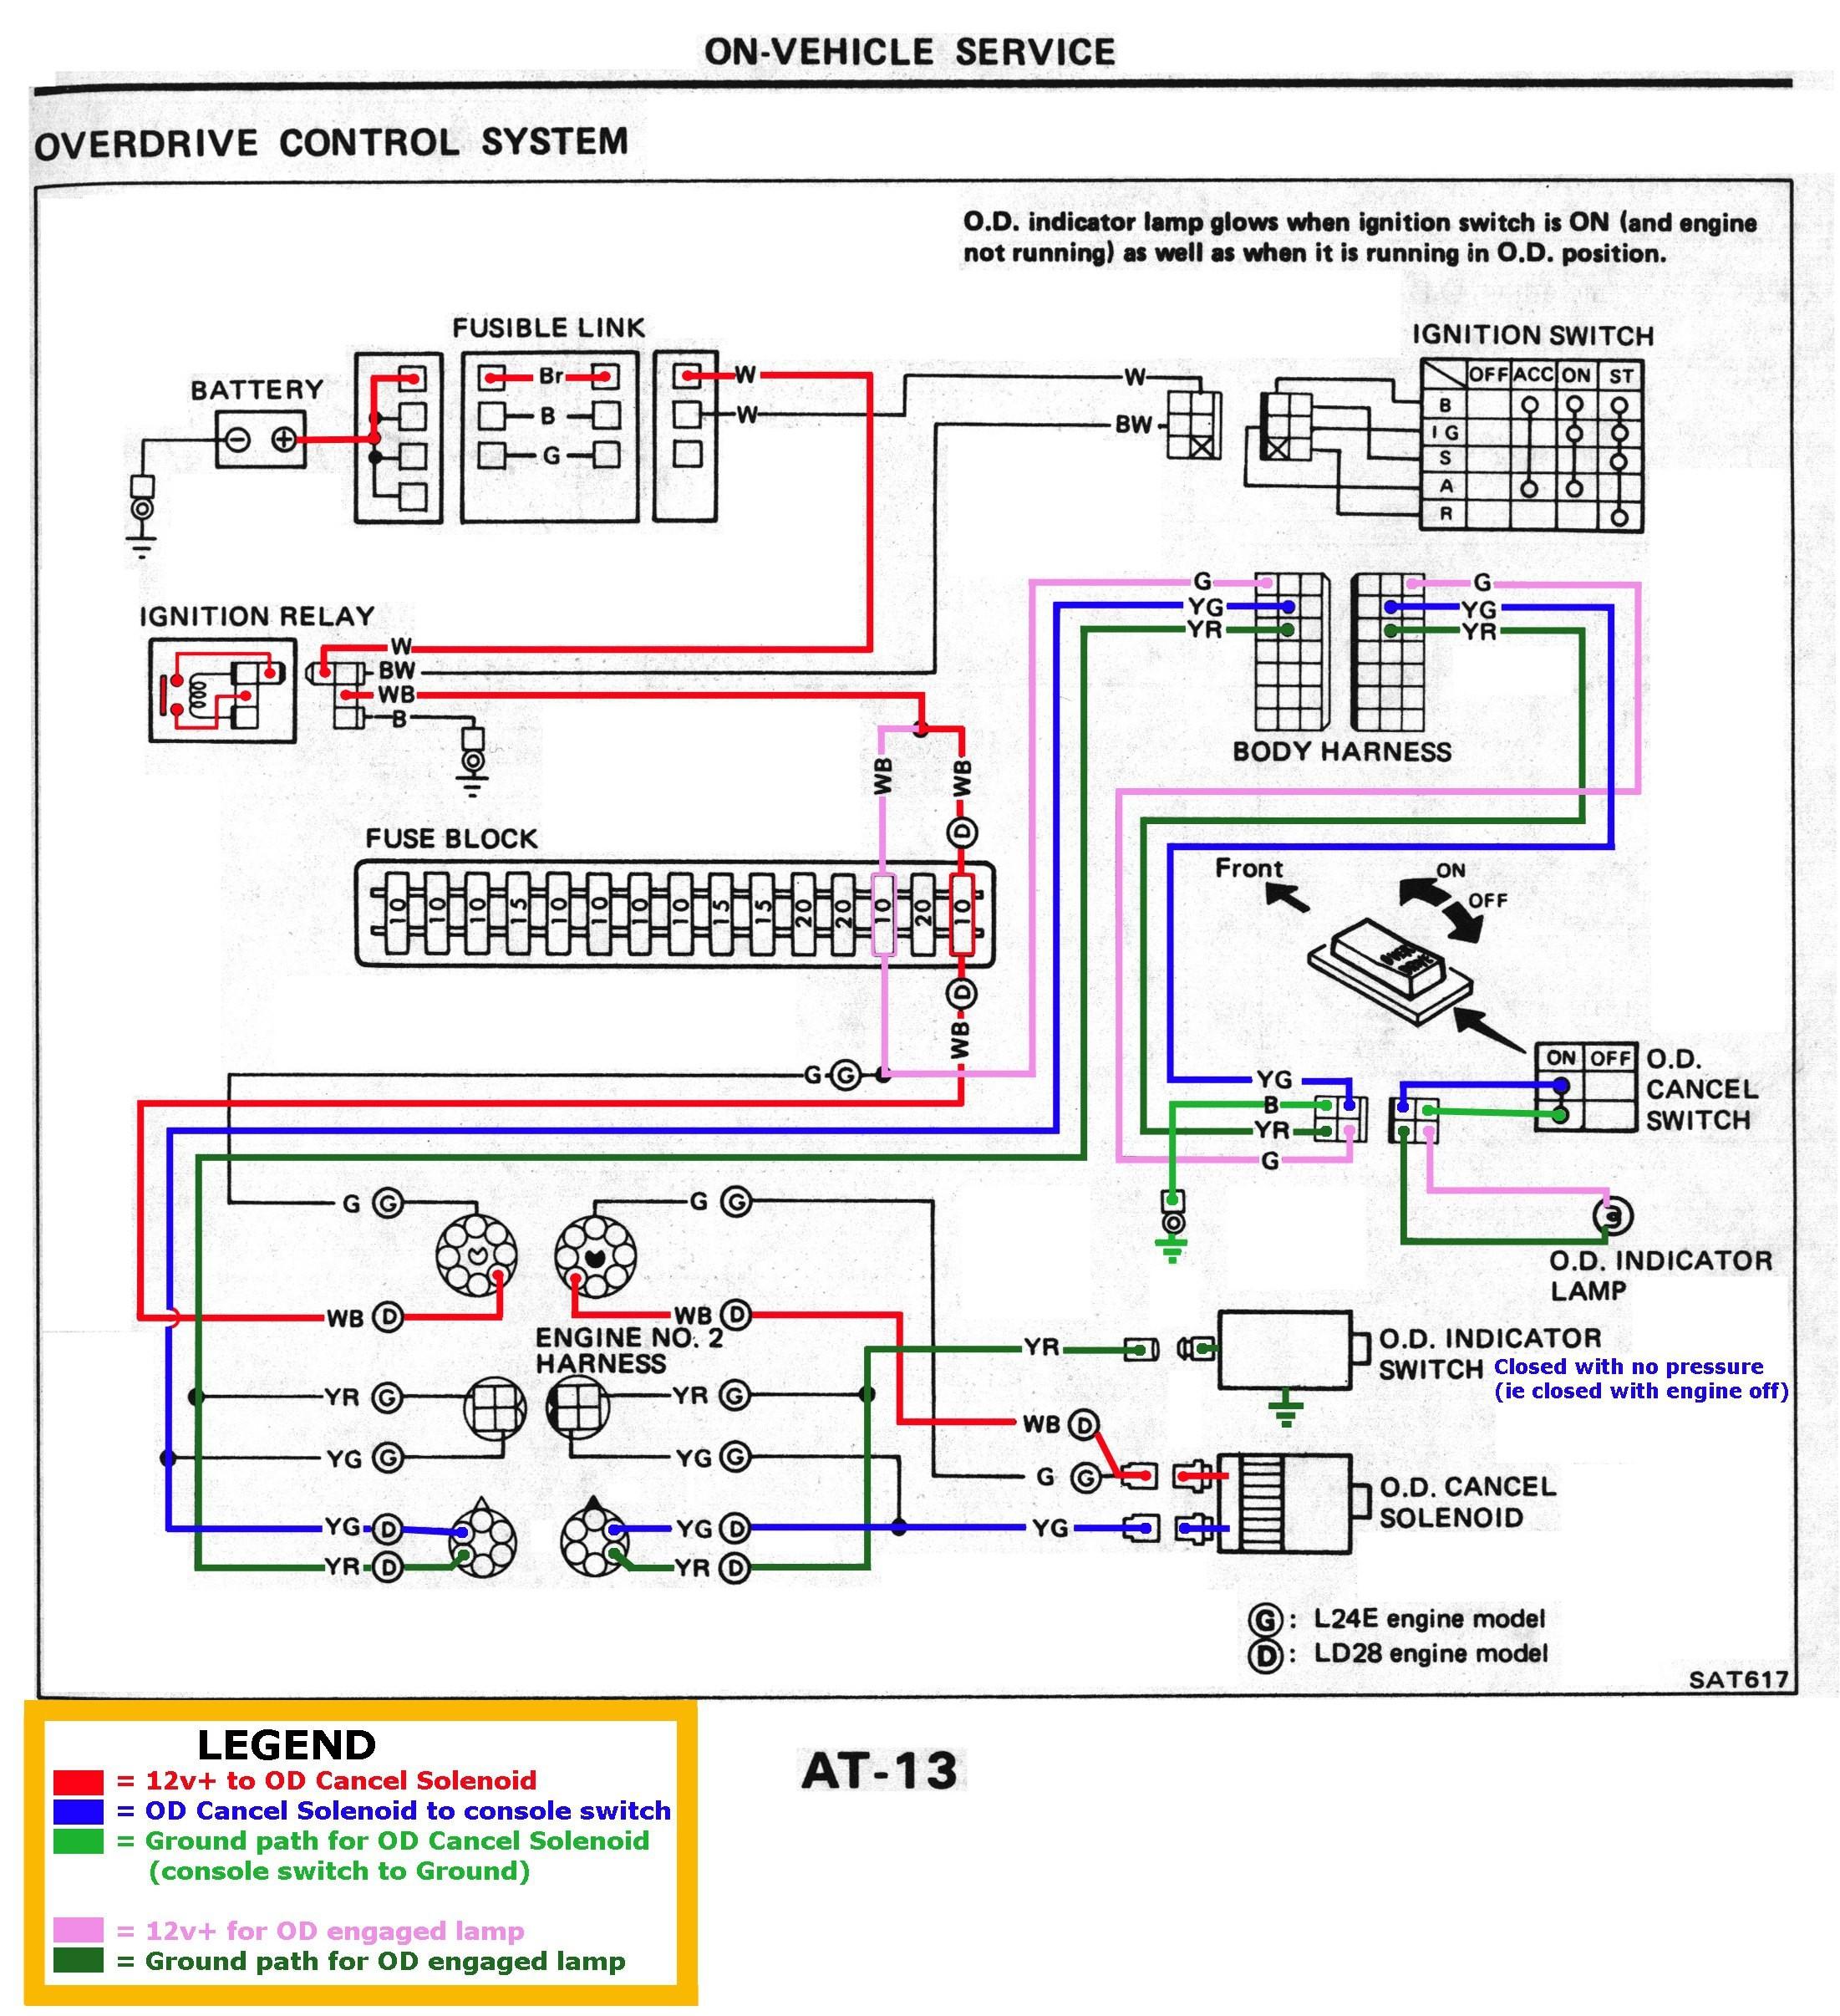 Nissan Micra Engine Diagram Wiring Diagram to Read Wiring Diagram Lovely  Nissan Caravan